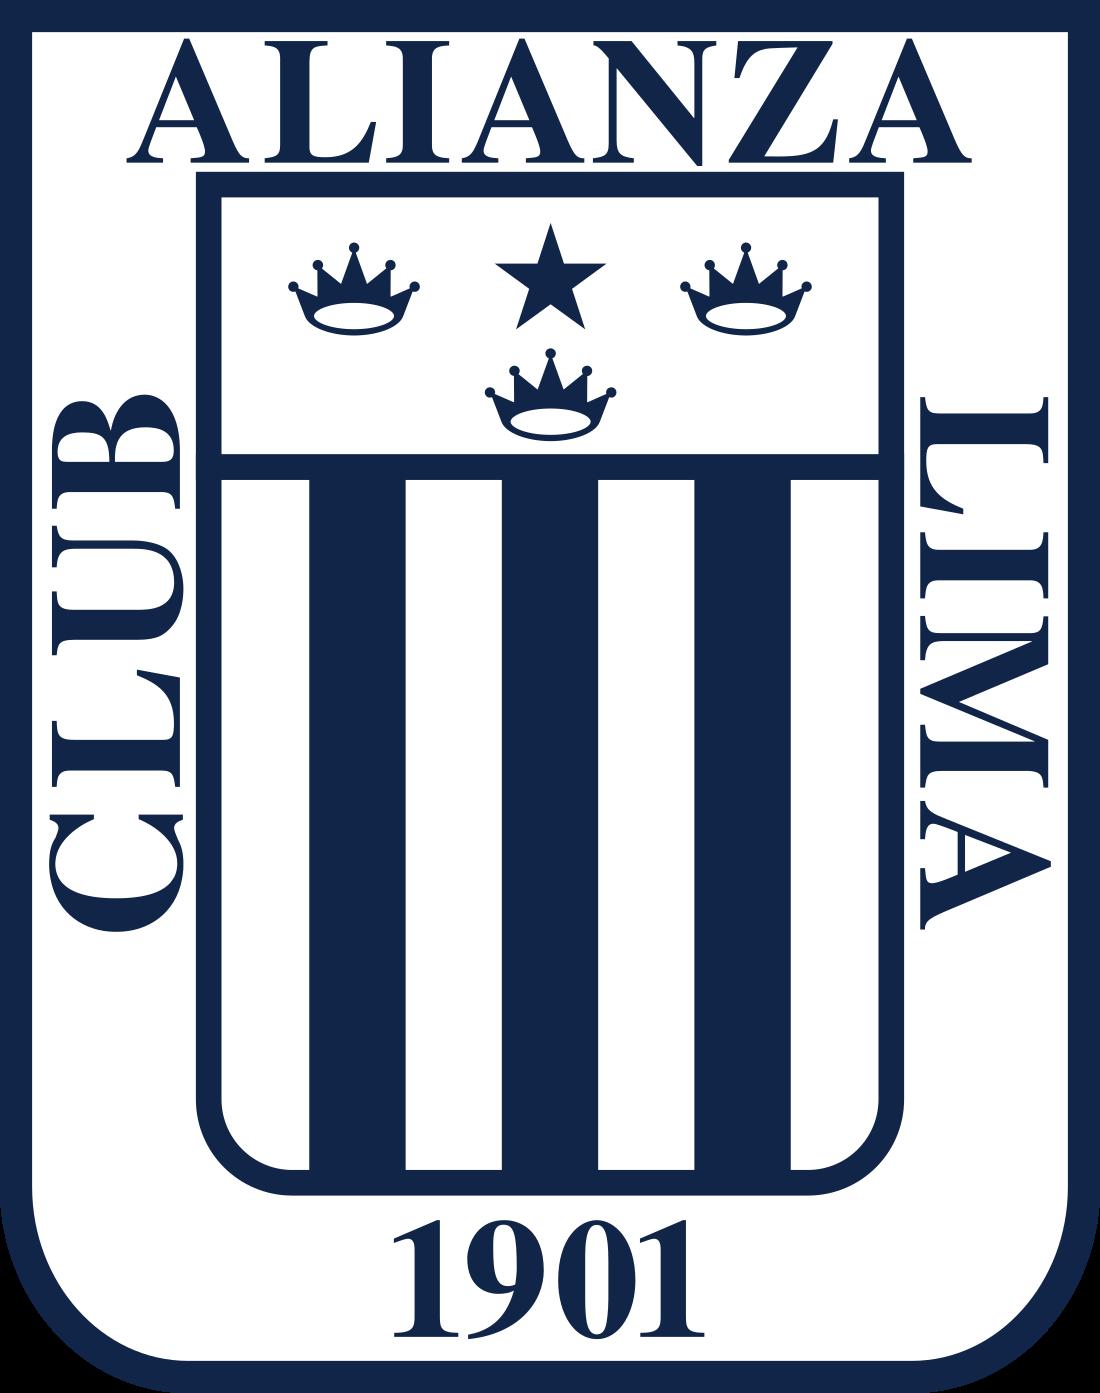 alianza lima logo escudo 3 - Alianza Lima Logo - Escudo